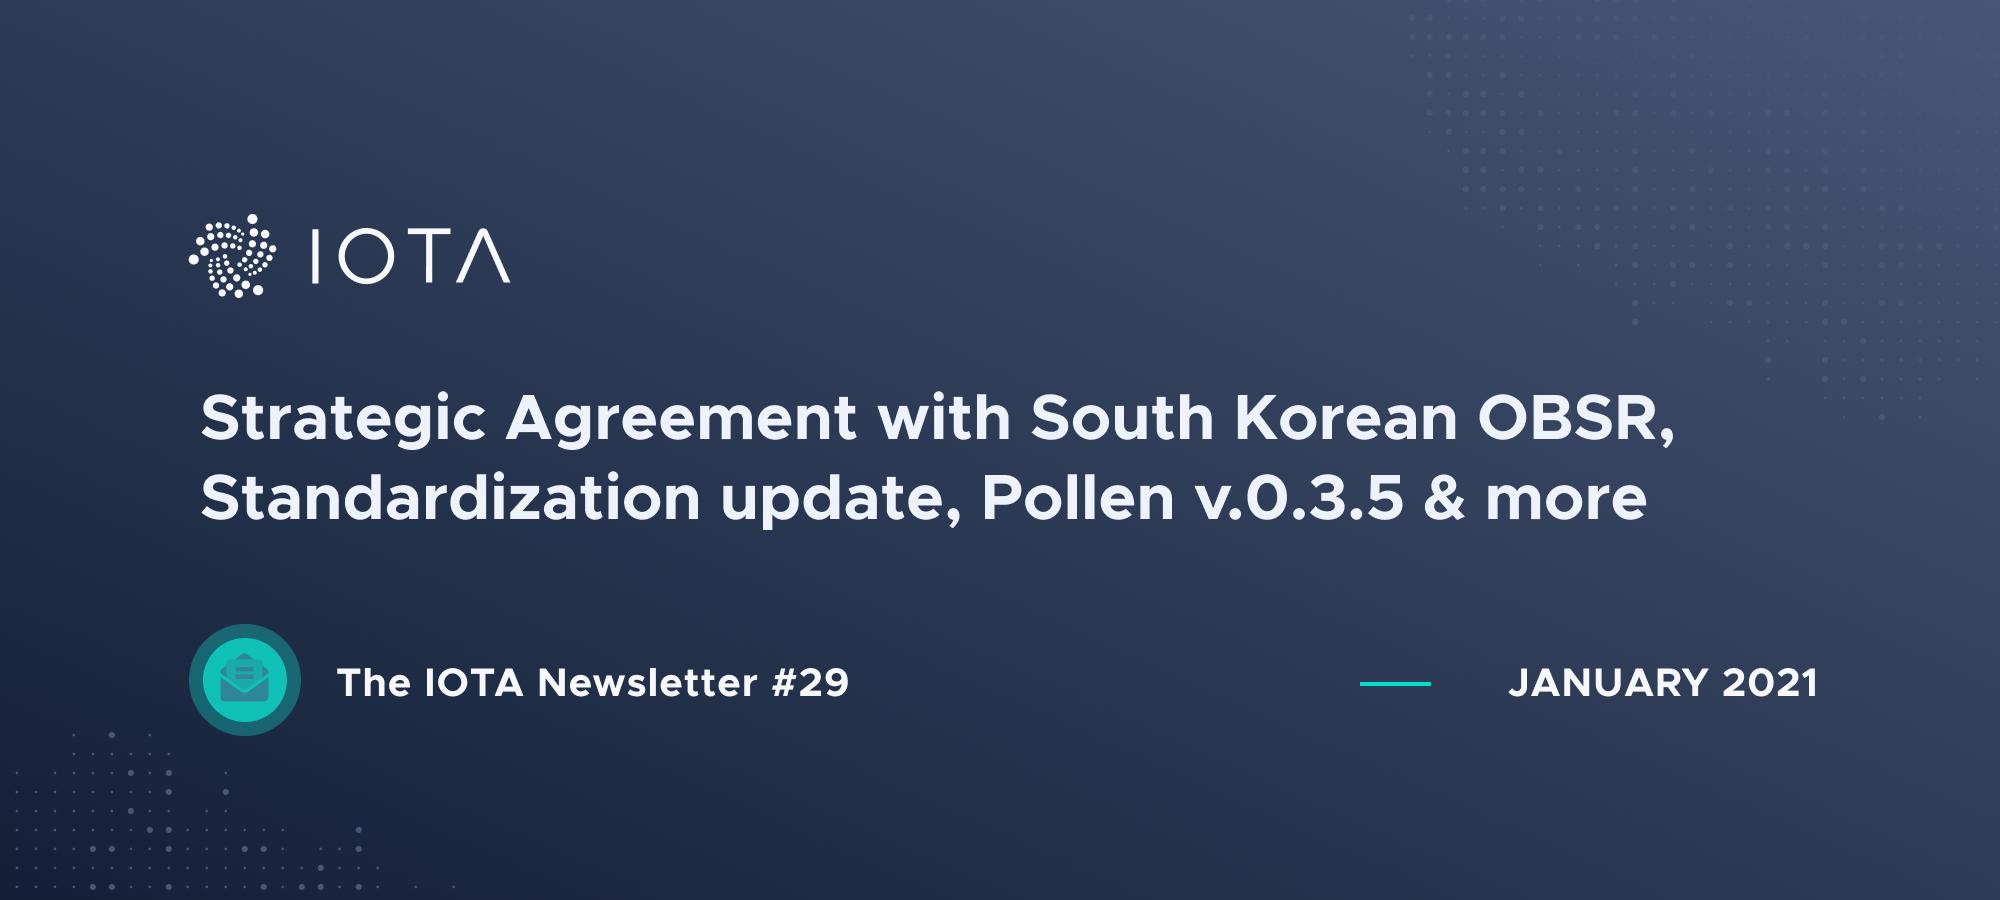 IOTA Newsletter #29 - Strategic Agreement with South Korean OBSR, Standardization update, Pollen v.0.3.5 & more.